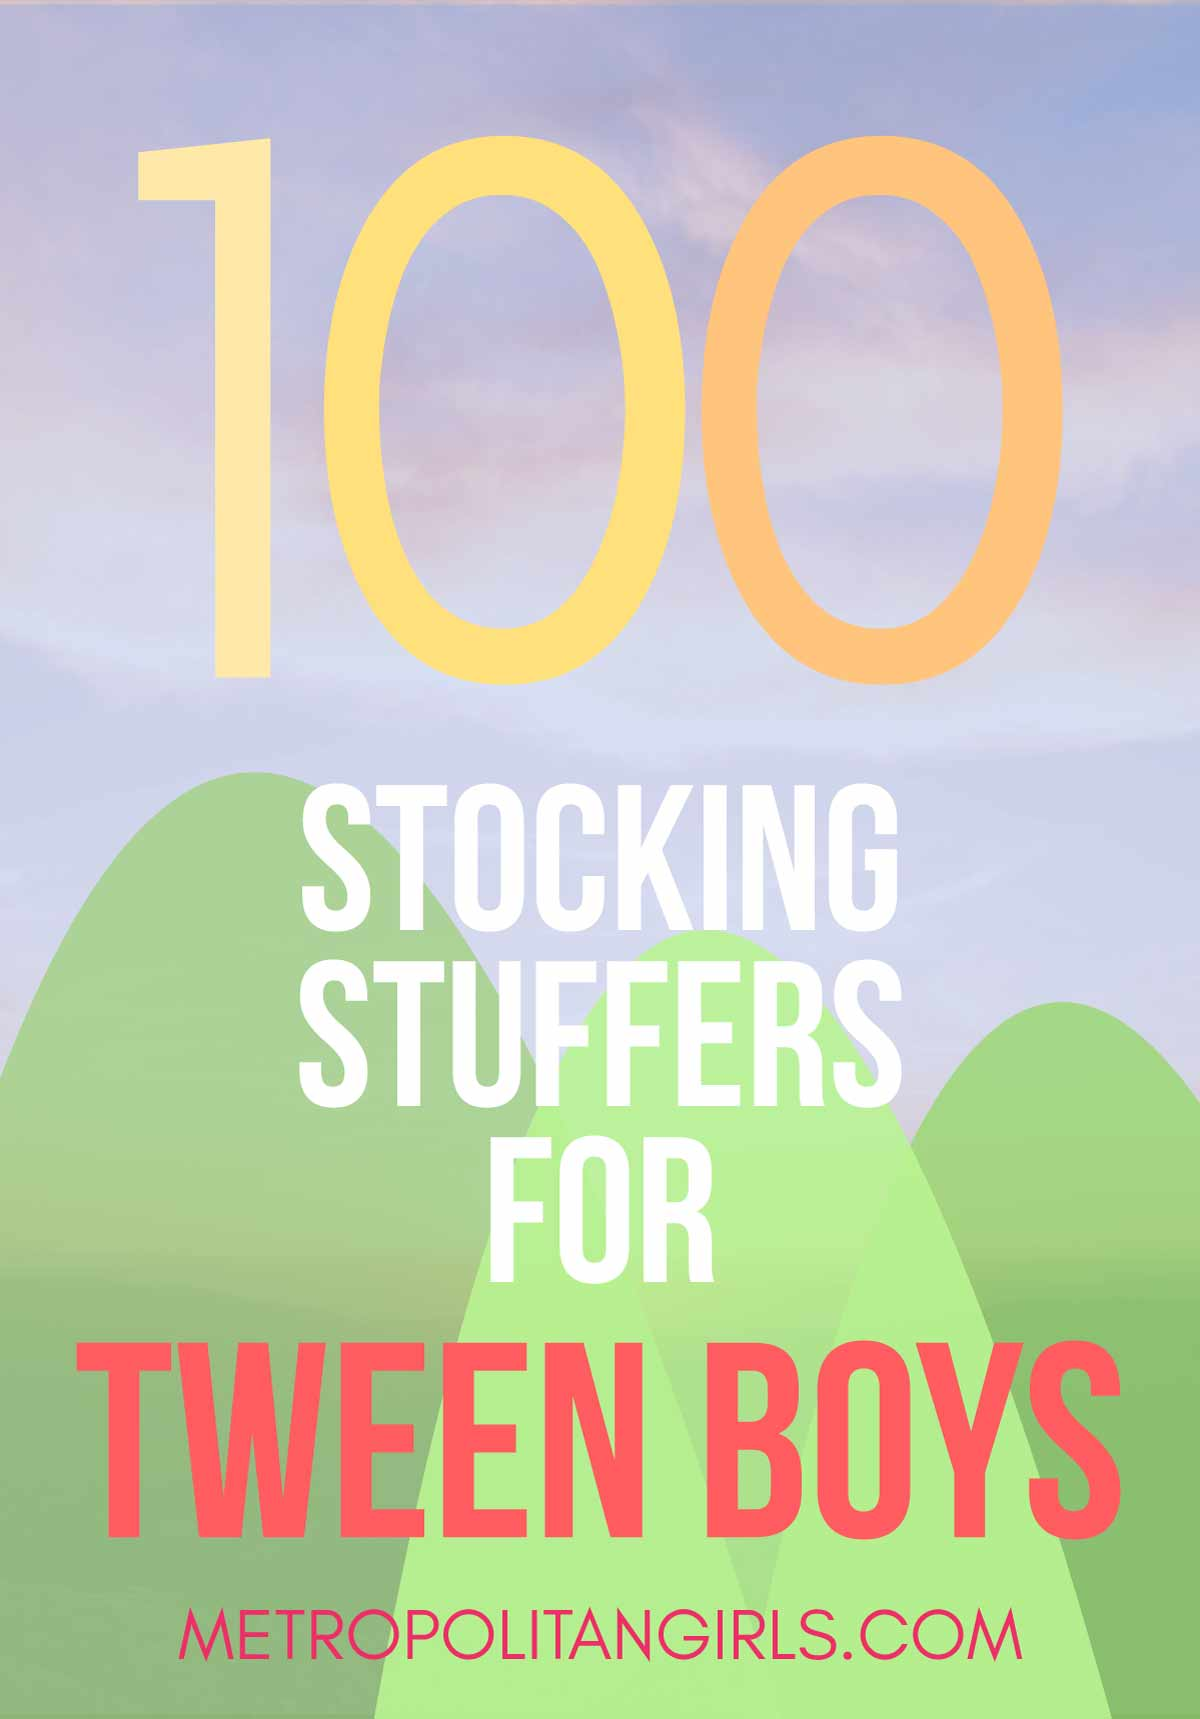 100 Chrismas Stocking Stuffer Ideas for Tween Boys